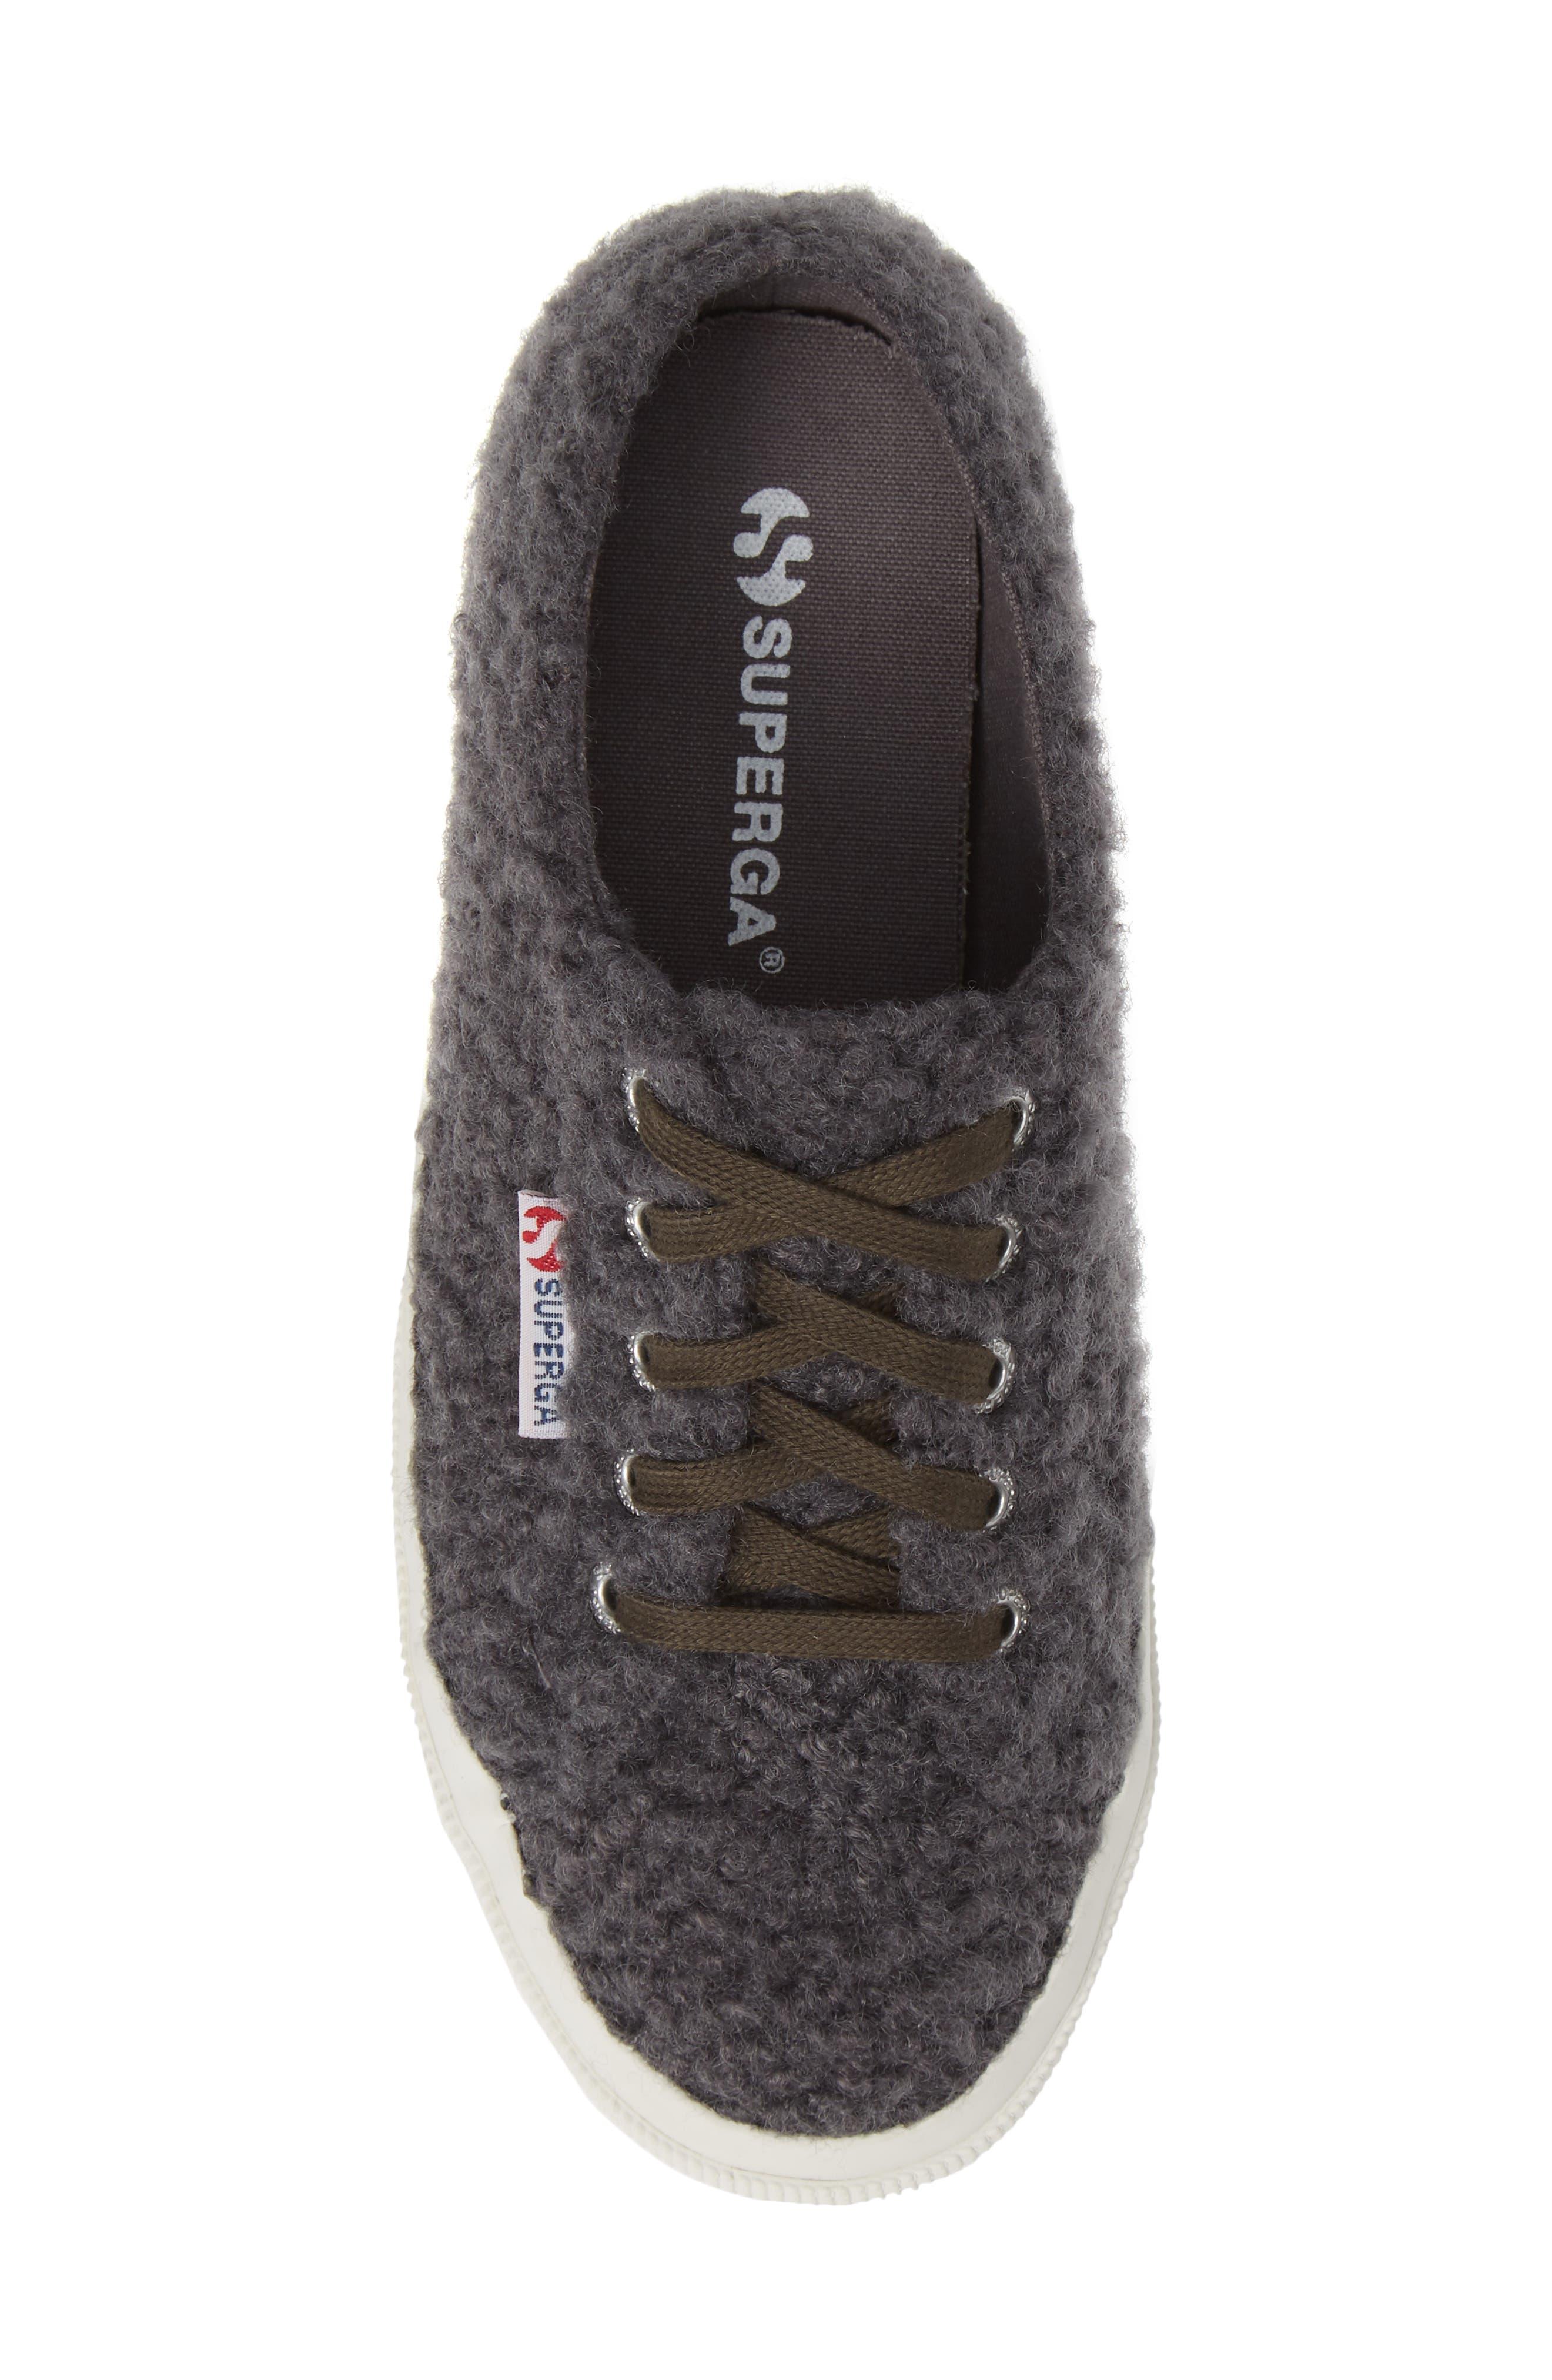 2759 Curly Wool Sneaker,                             Alternate thumbnail 5, color,                             DARK GREY/ GREY